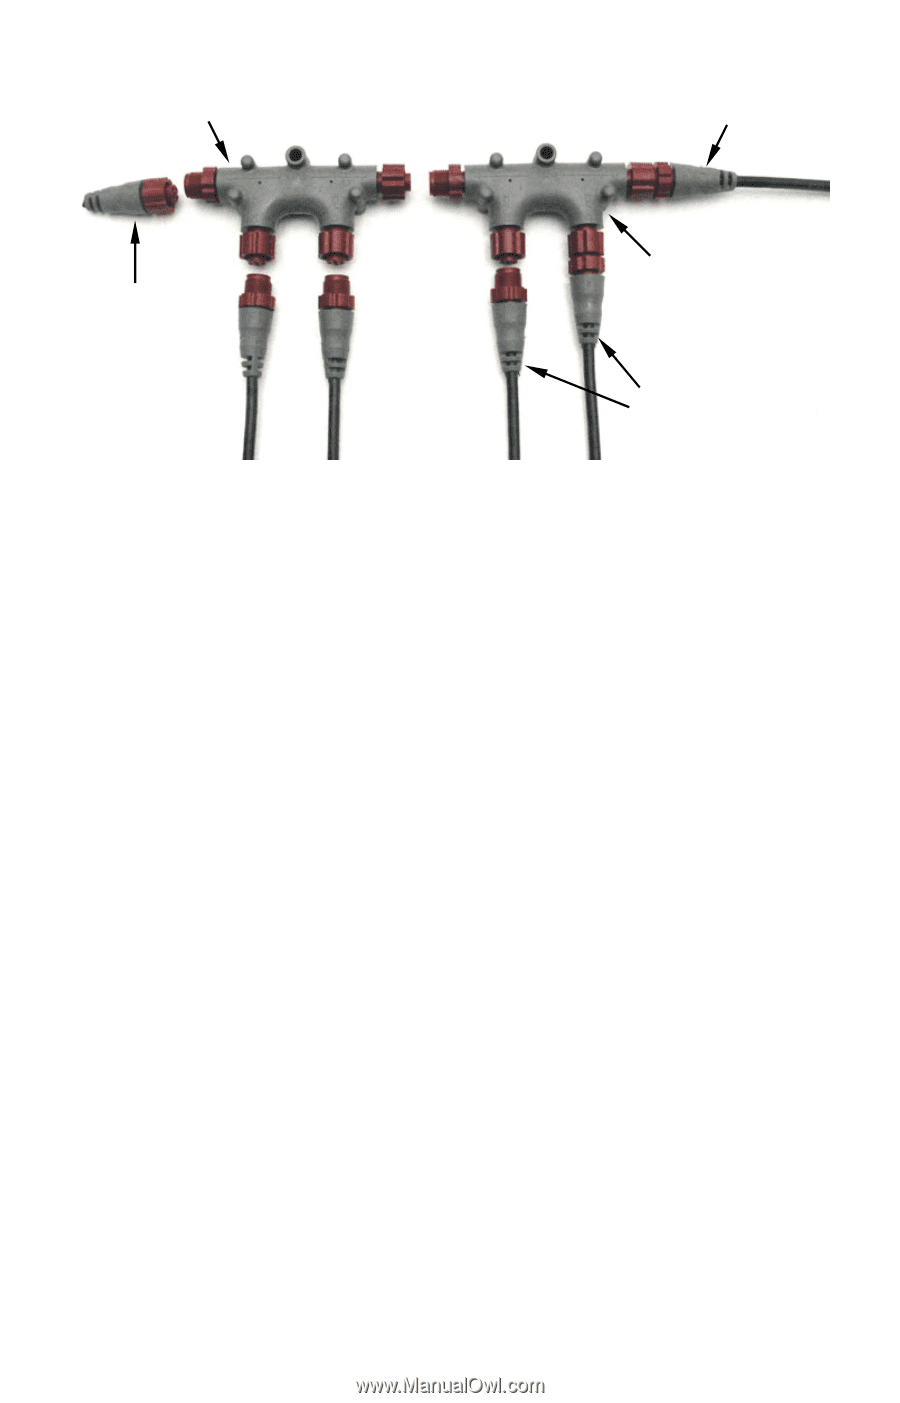 Lowrance EP-65R Fluid Level Sensor | Installation